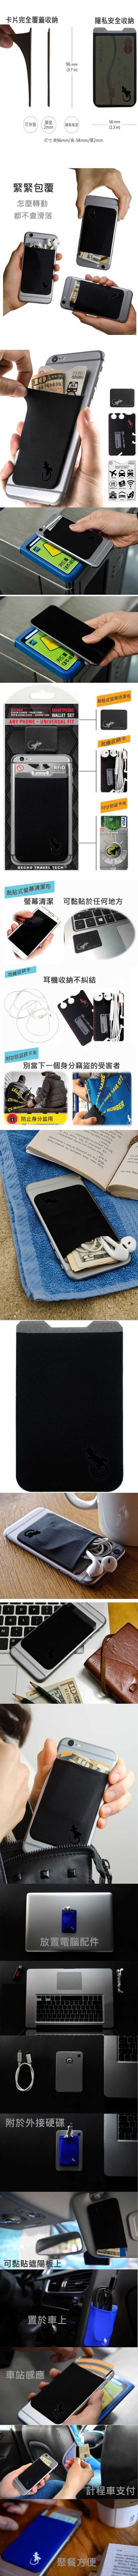 Gecko Travel Tech|防盜卡夾手機貼5件組-黑色(黑壁虎)